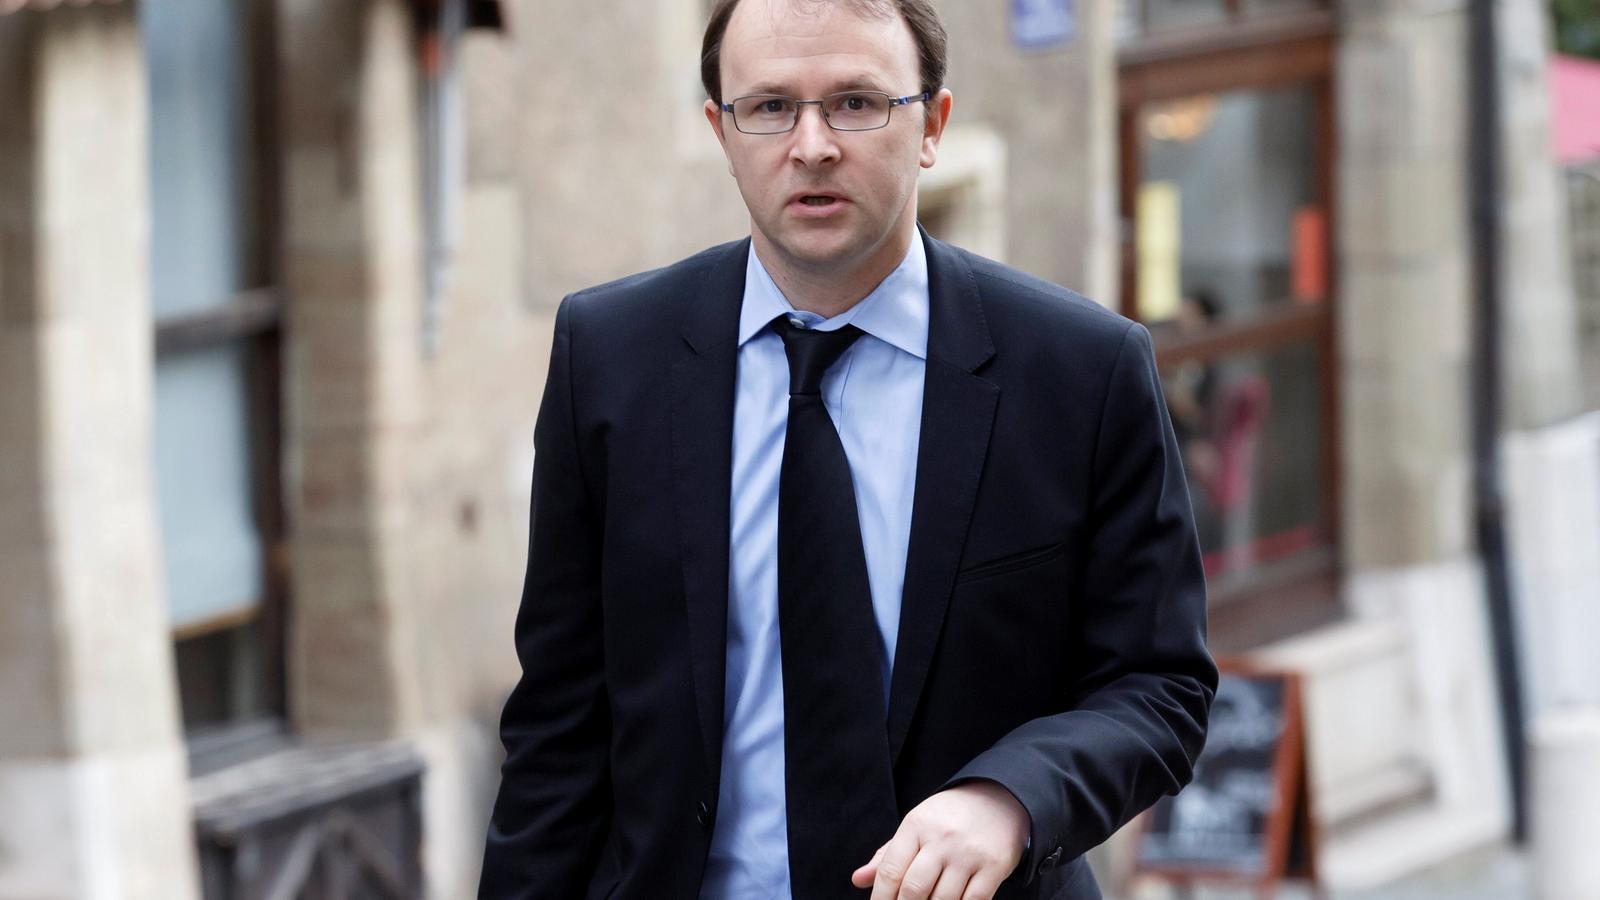 Yves Bertossa, arribant a la seu del Tribunal Federal, a Ginebra, Suïssa